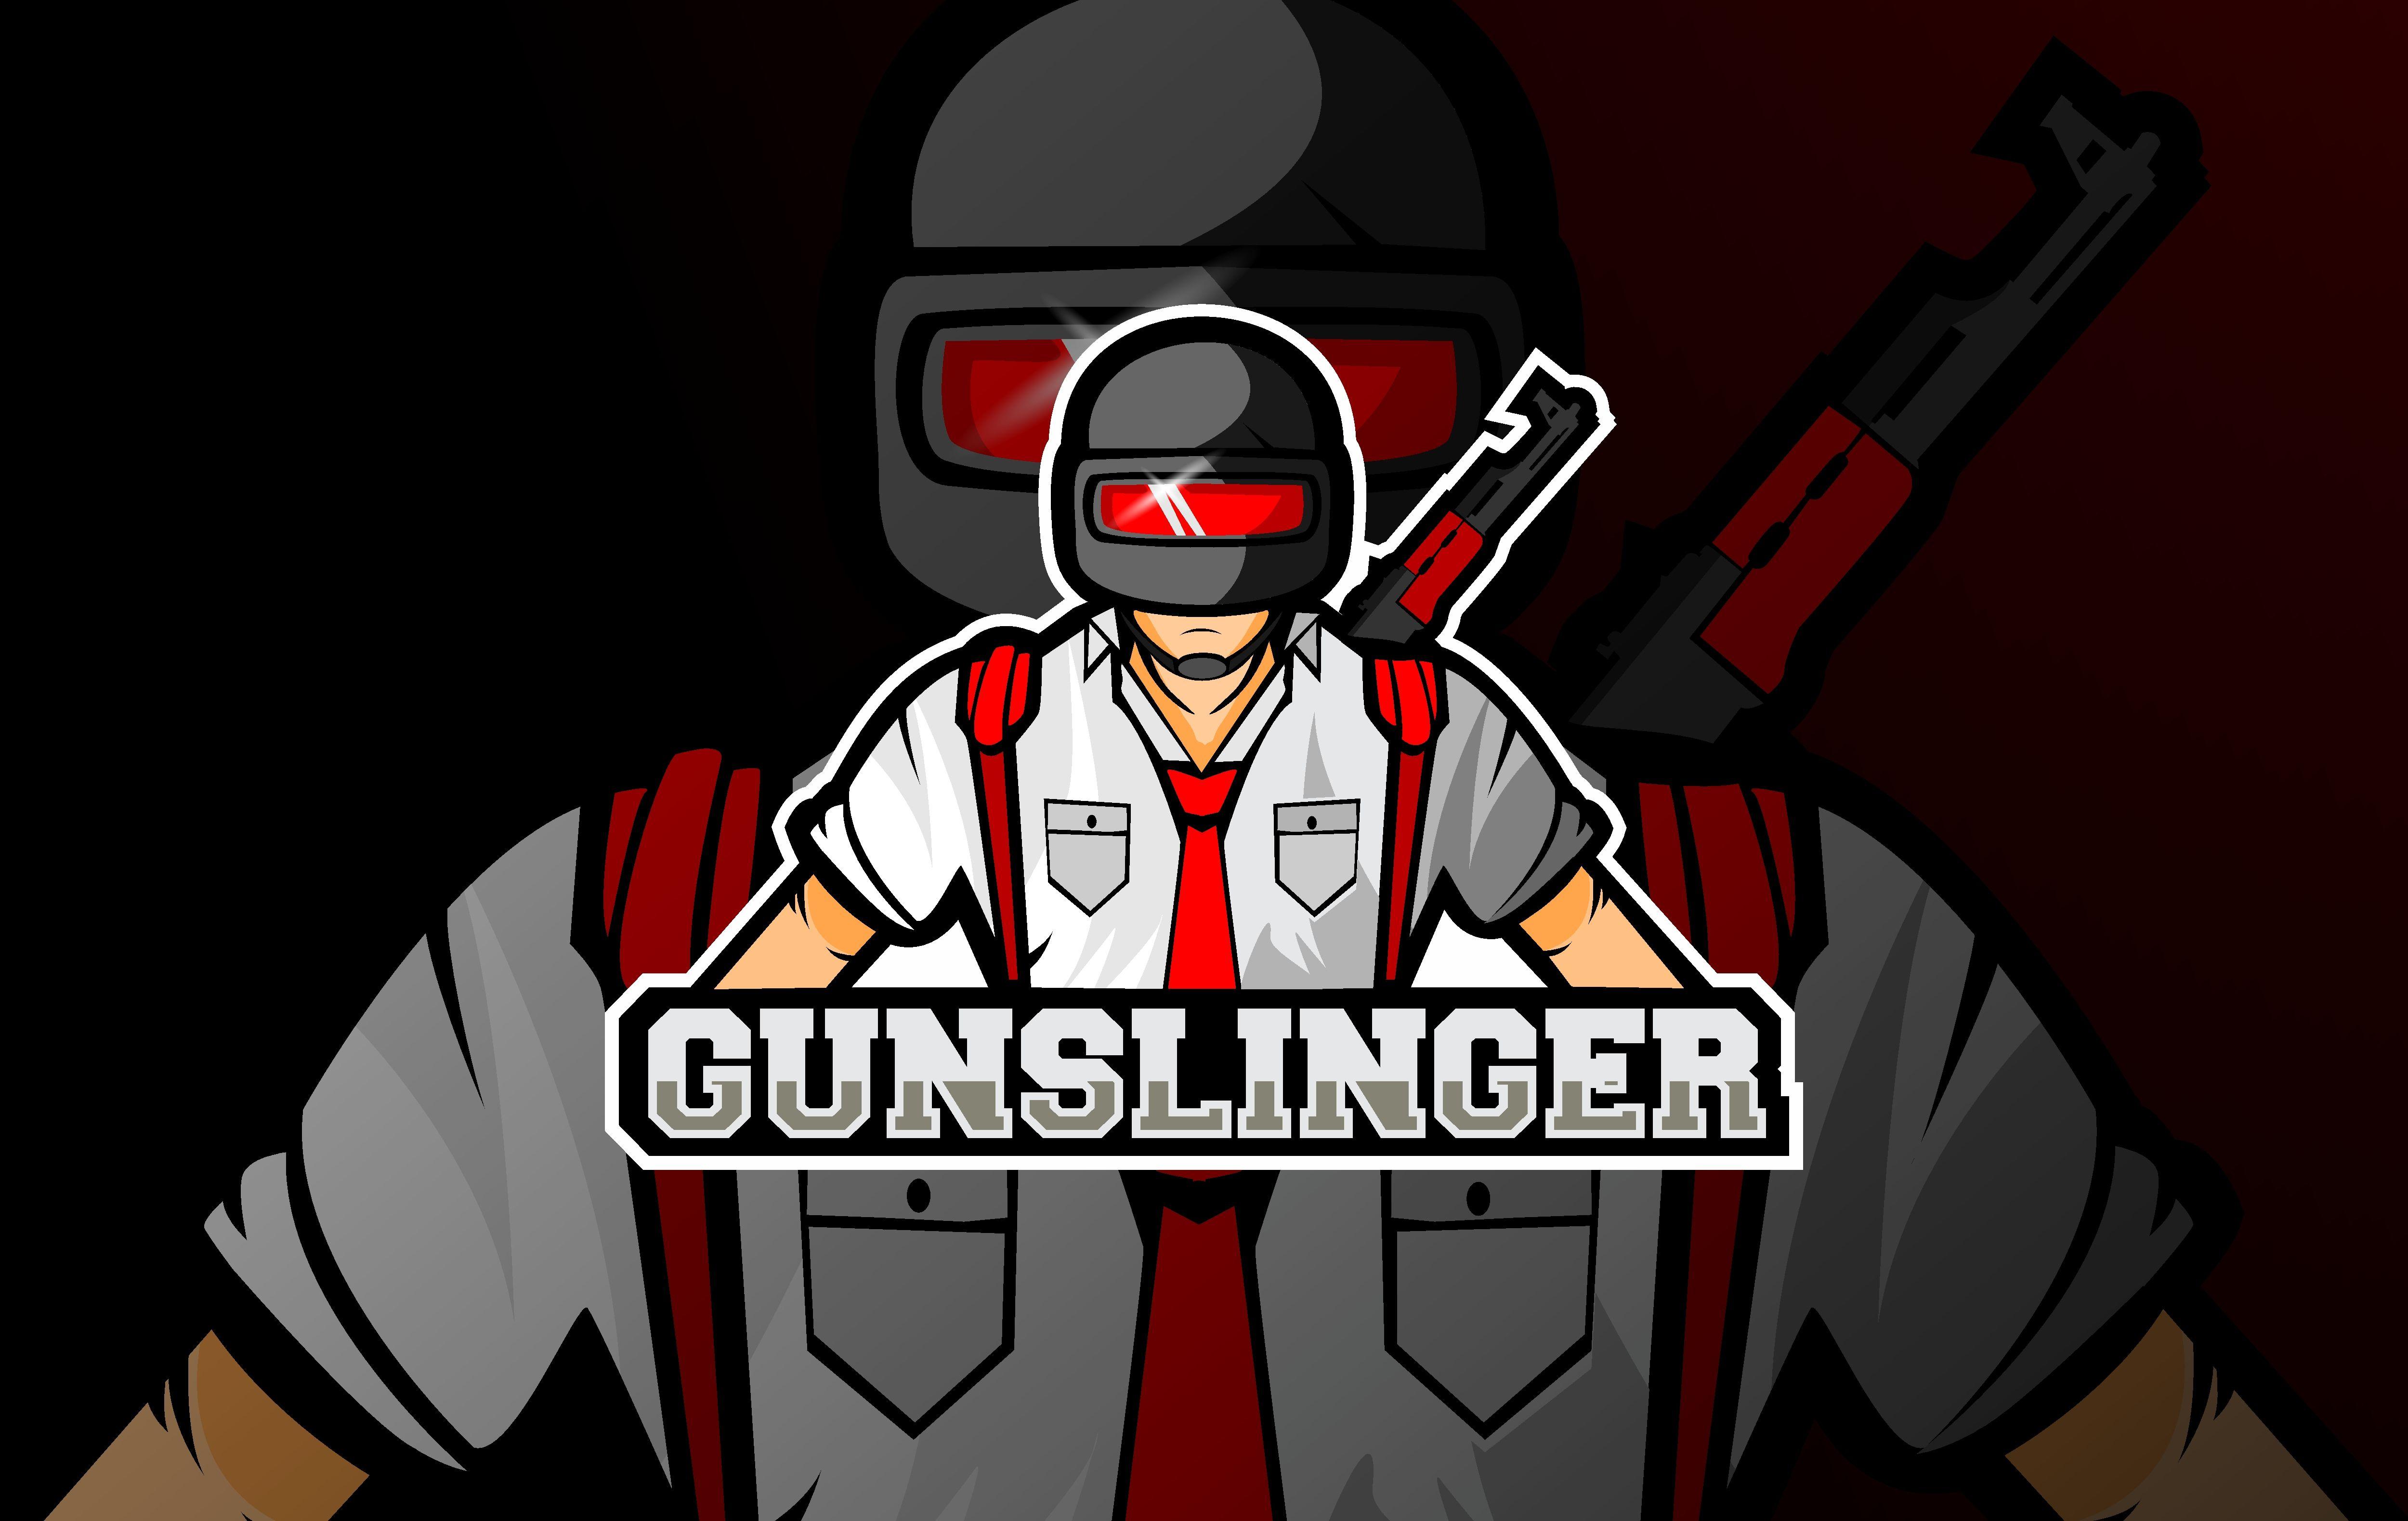 Pubg Hd Stickers: 3840x2400 Gunslinger Pubg 4k 4k HD 4k Wallpapers, Images